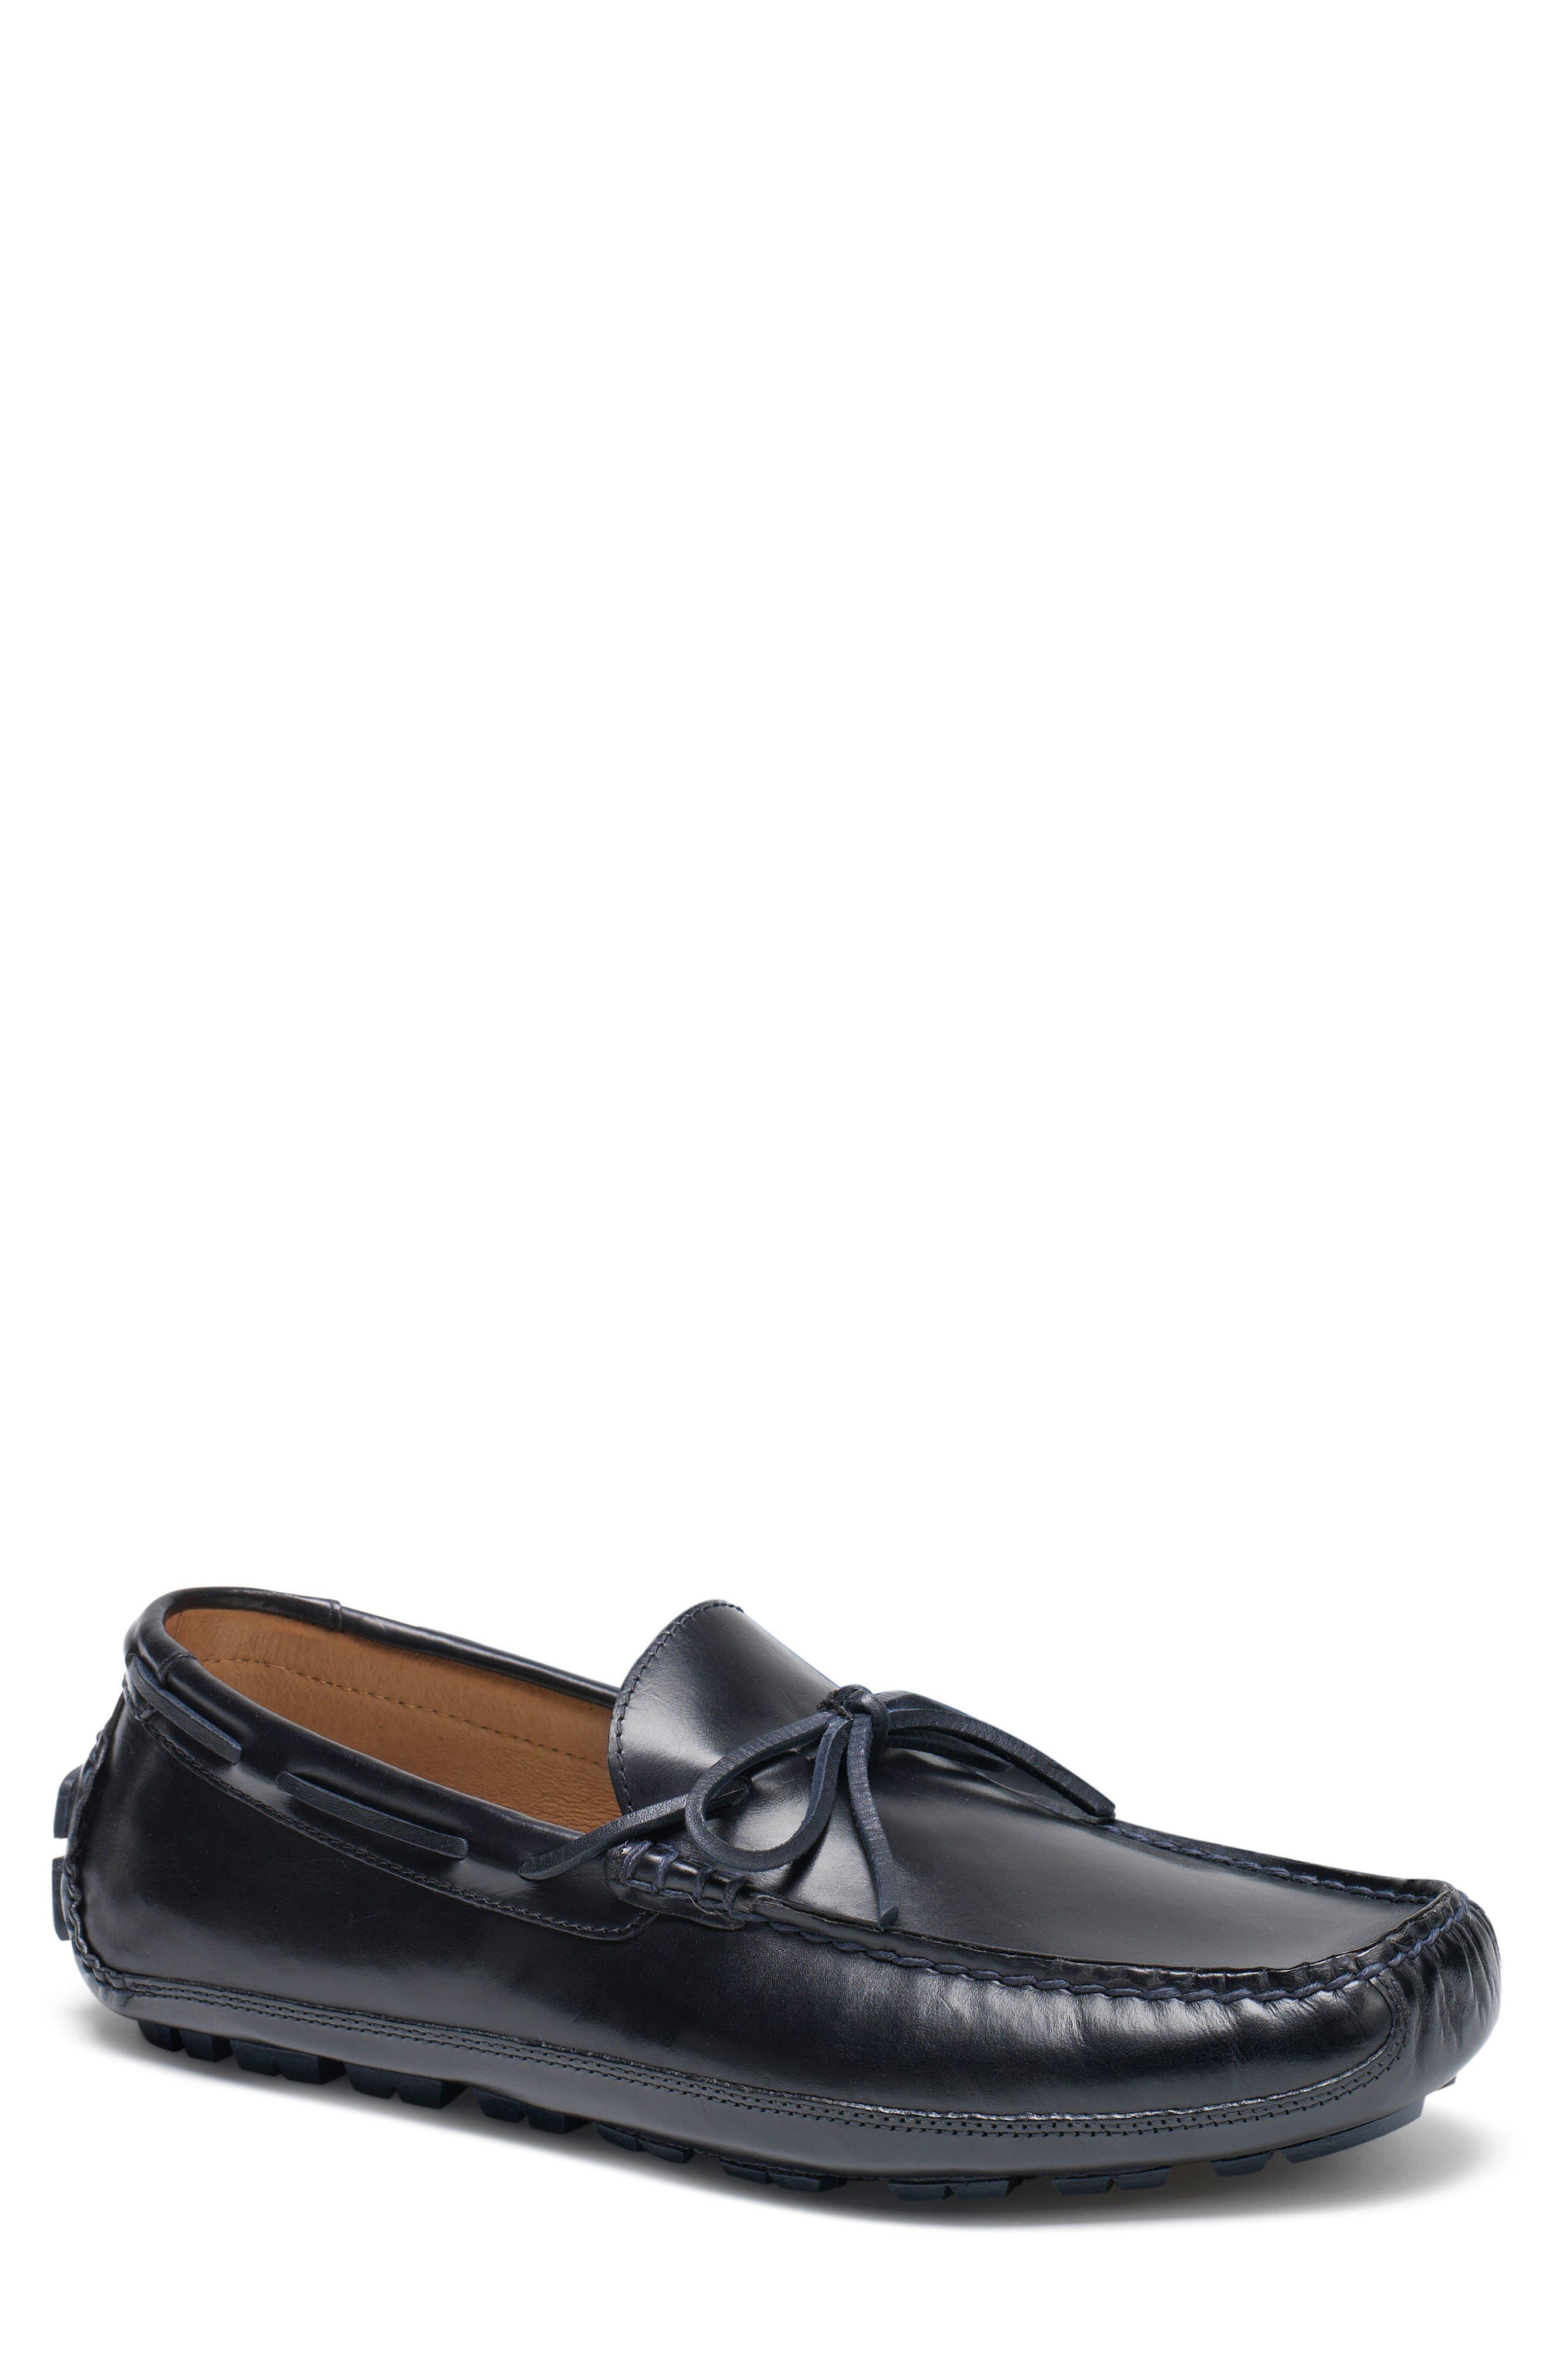 Alternate Image 1 Selected - Trask Dillion Driving Loafer (Men)